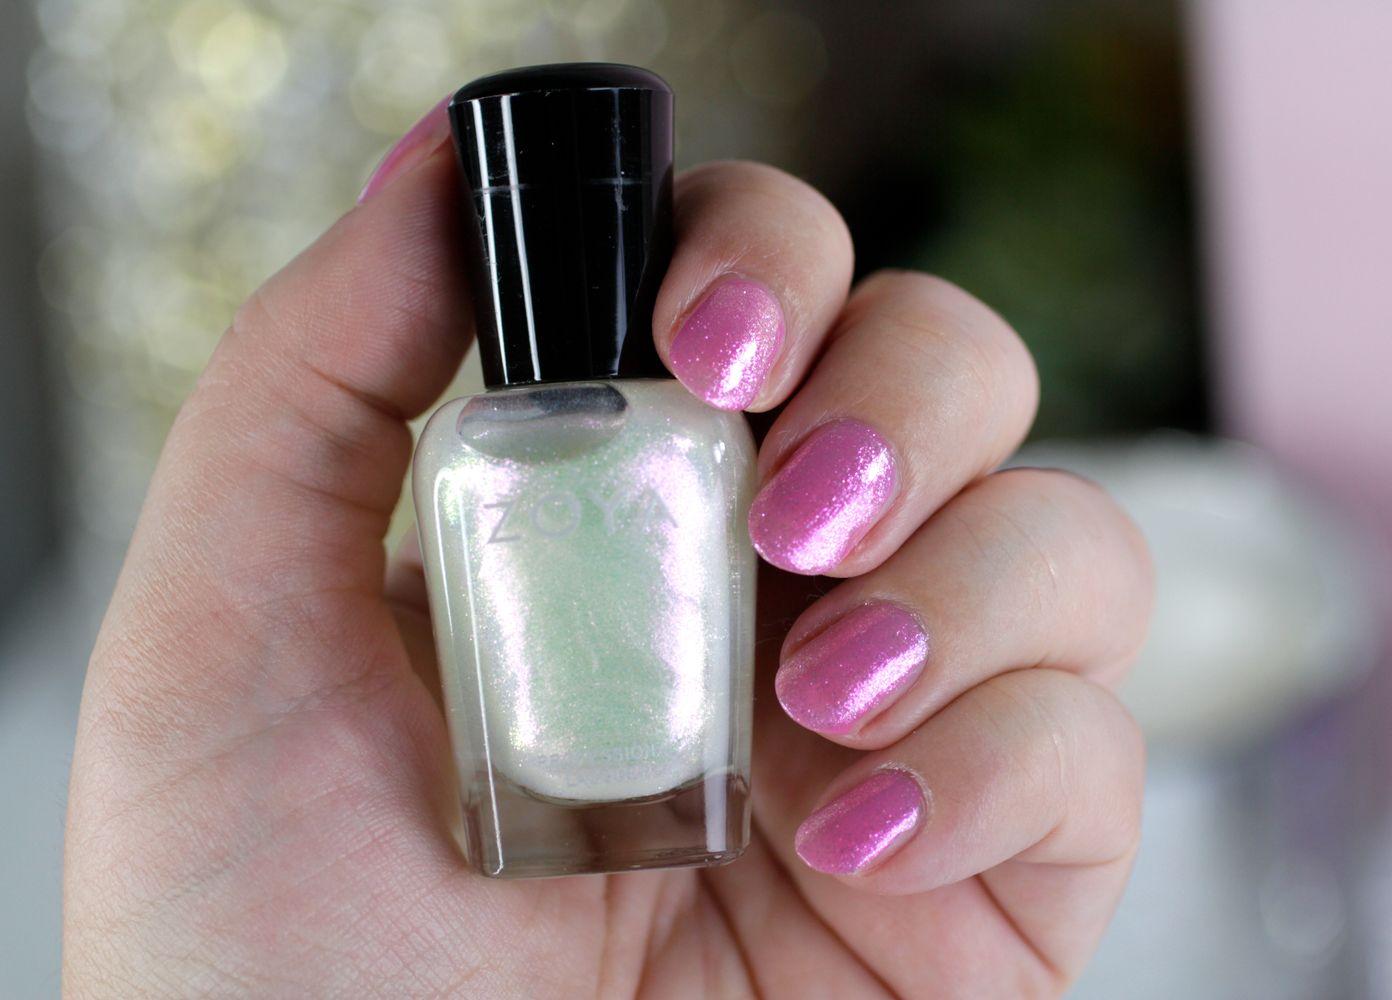 Zoya Nail Polish Review | Cruelty free, Zoya nail polish and Vegan ...